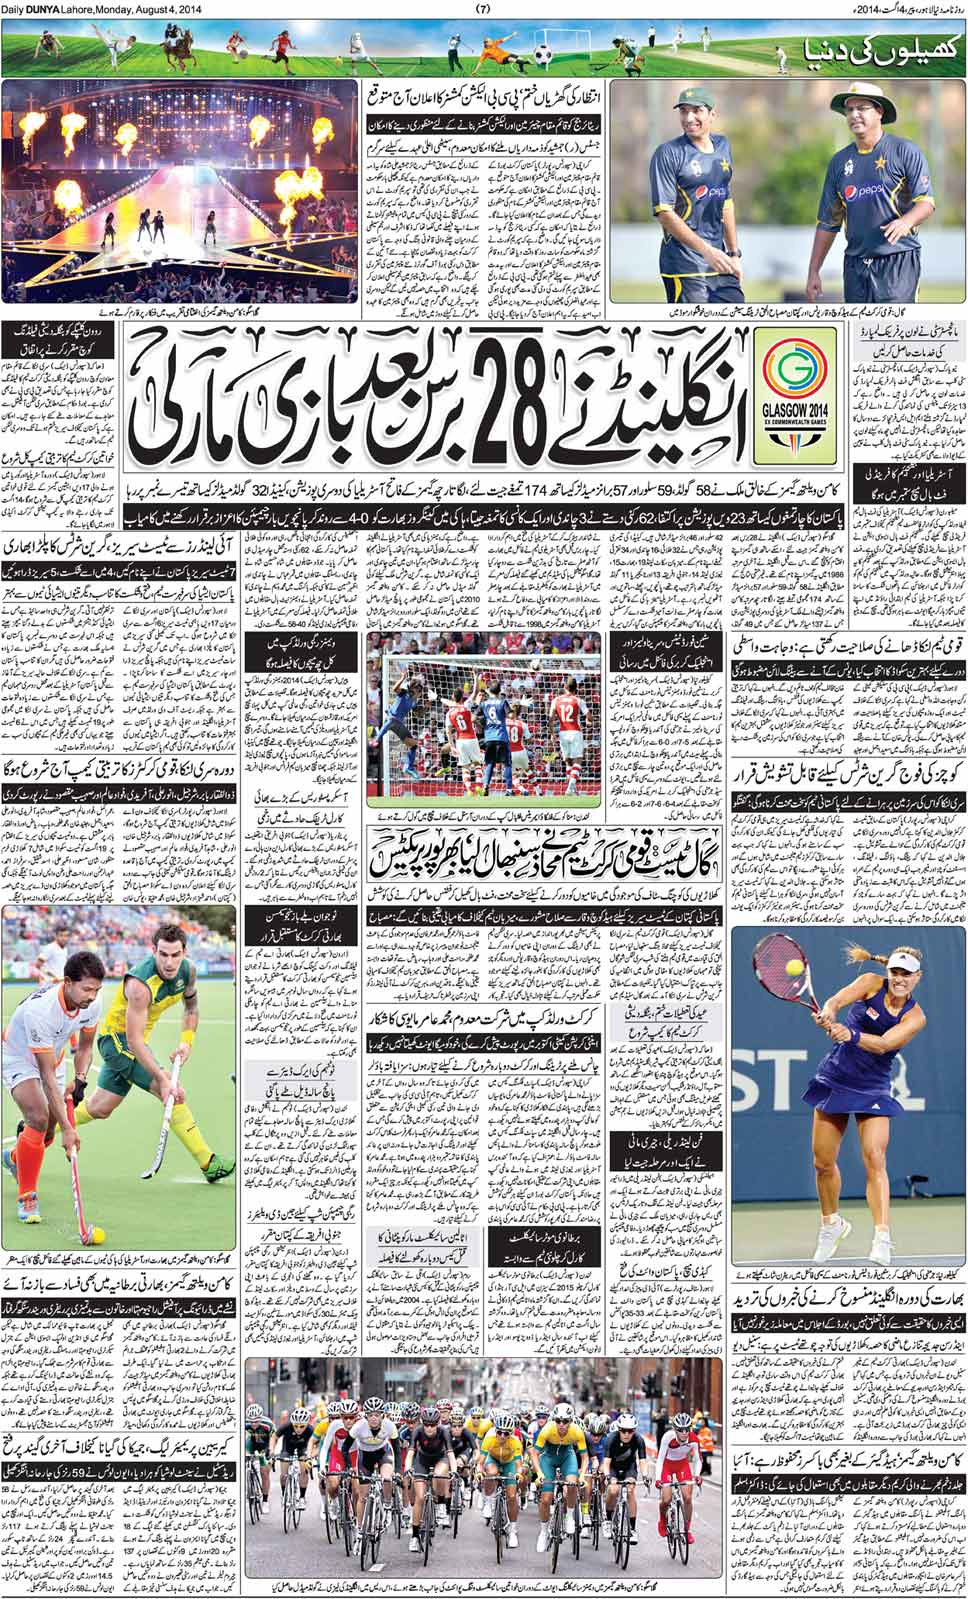 Roznama Dunya Lahore Edition 04 August 2014 Daily Dunya Epaper Roznama Dunya Urdu Newspaper Daily Urdu News